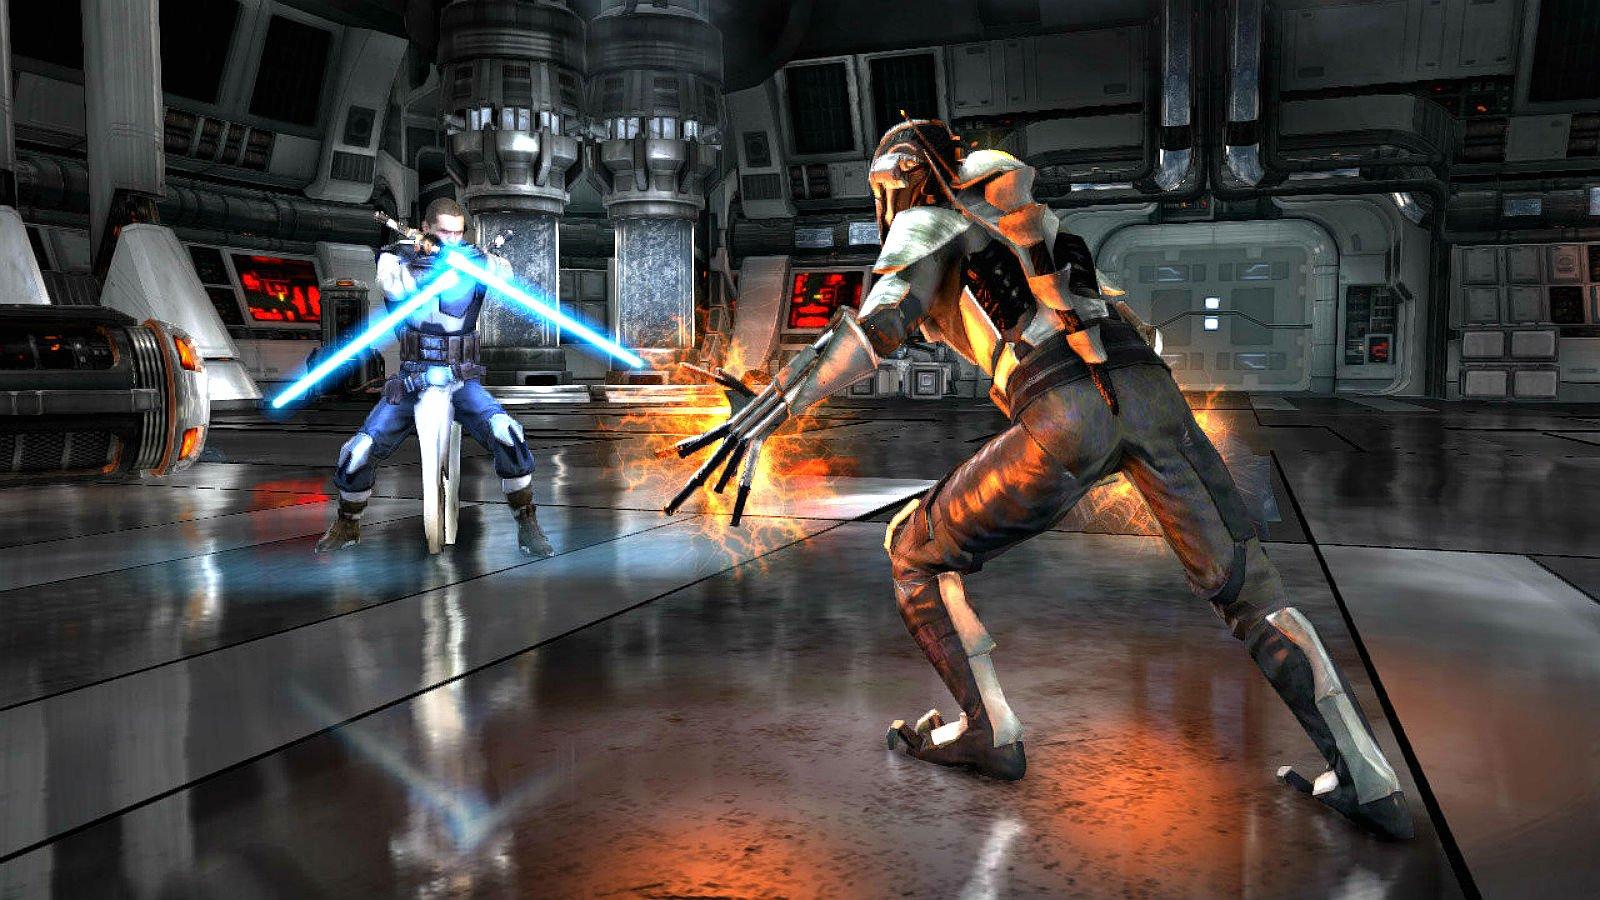 star wars games - HD1600×900